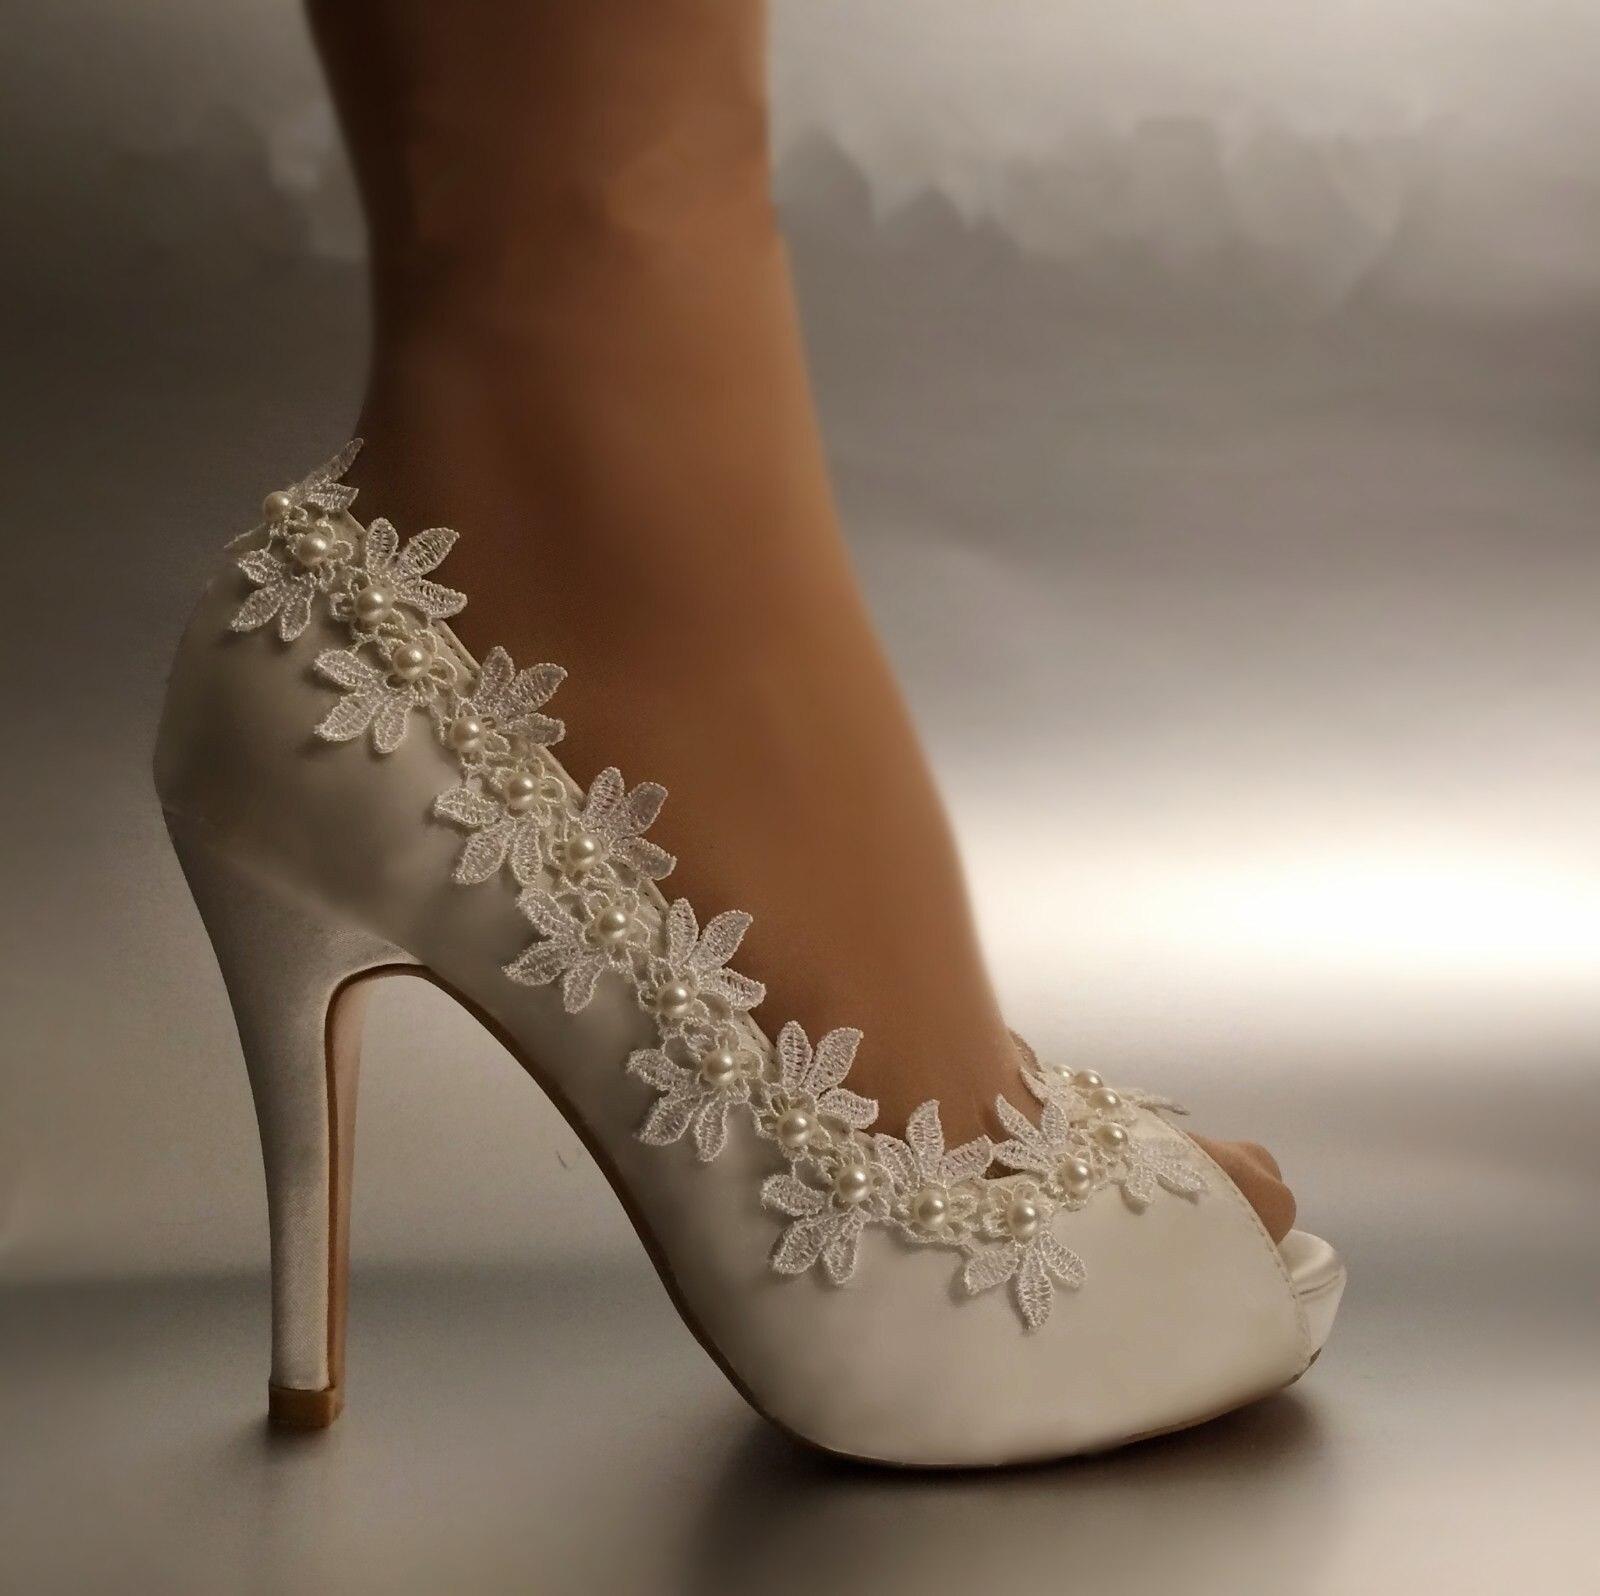 ФОТО Shoes Women Pumps Peep toe Open toe lace wedding shoes silk stain appliques size 41